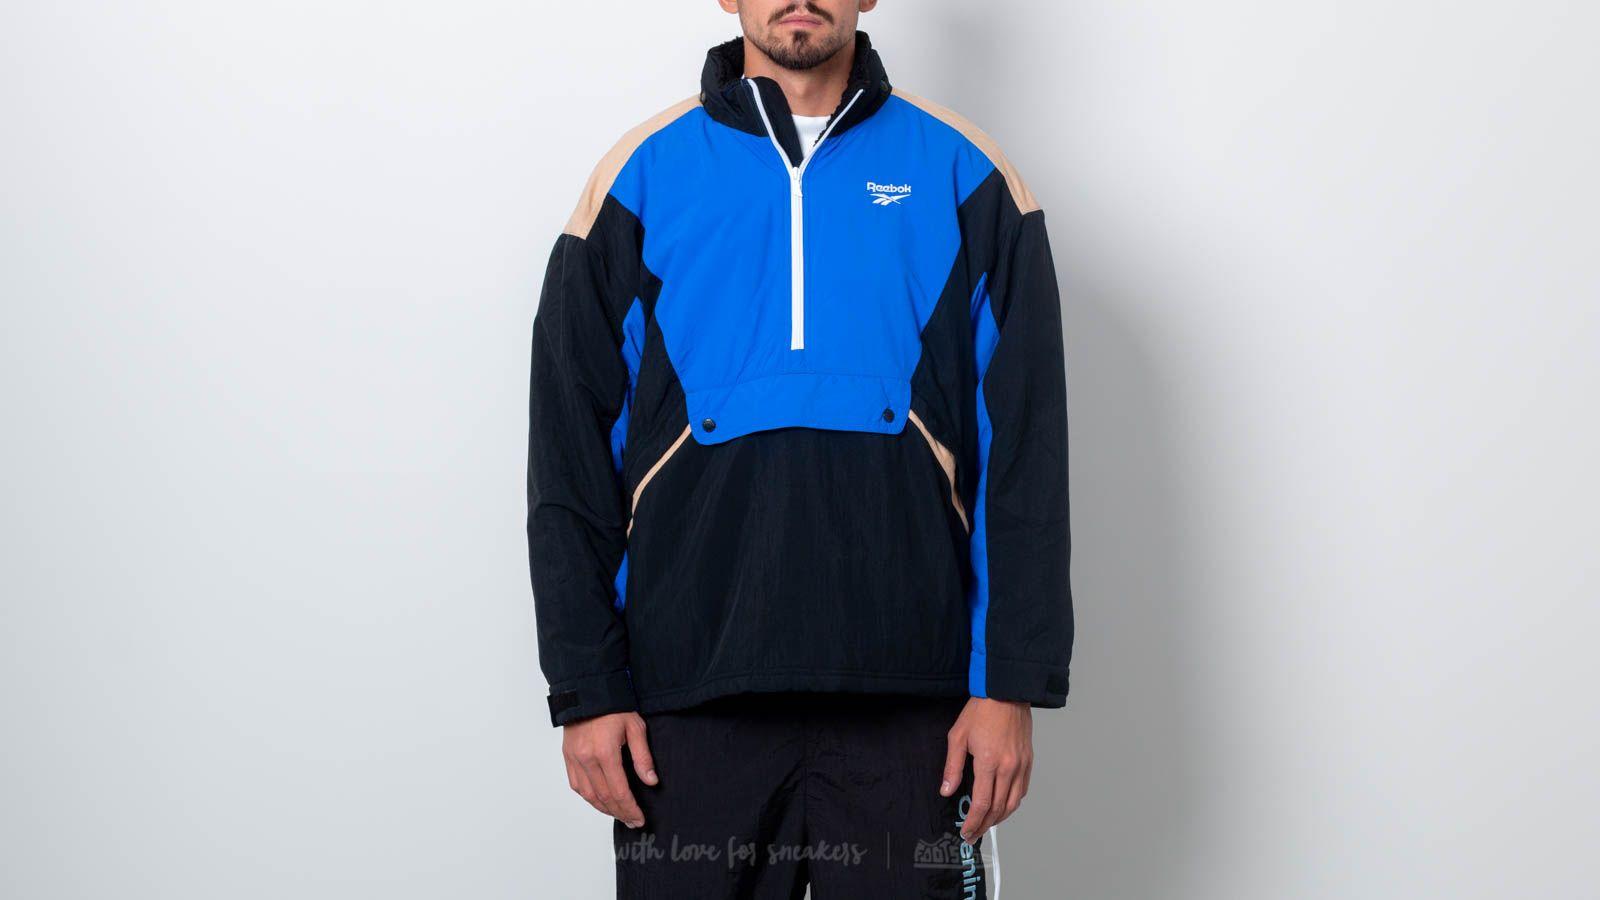 21605a8b61d Reebok Classics Vector Unisex Anorak Jacket Black  Blue at a great price  £127 buy